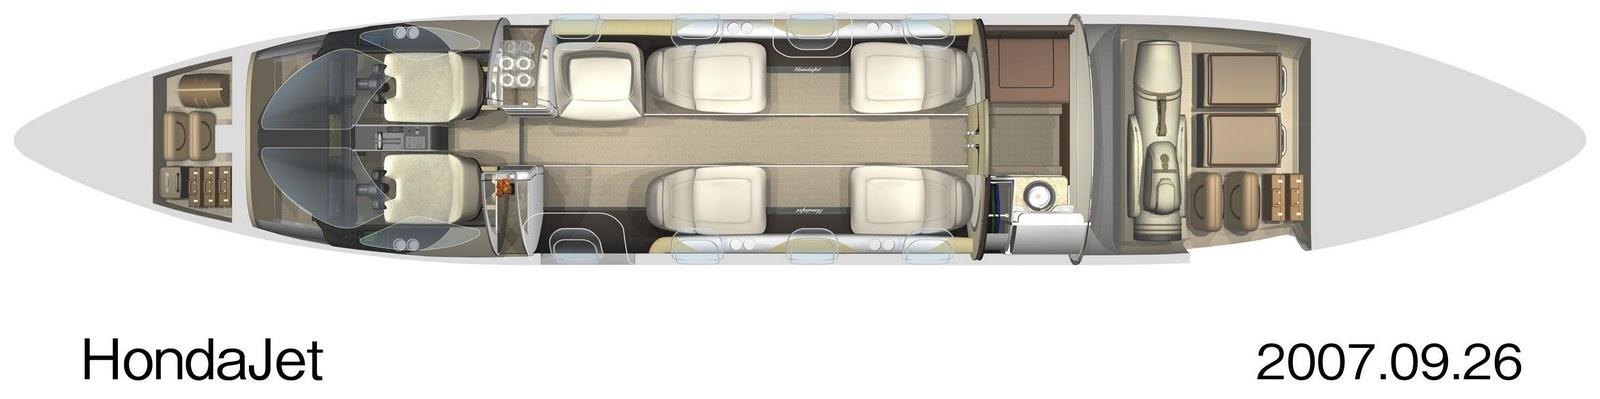 аренда частного самолета HondaJet HA-420